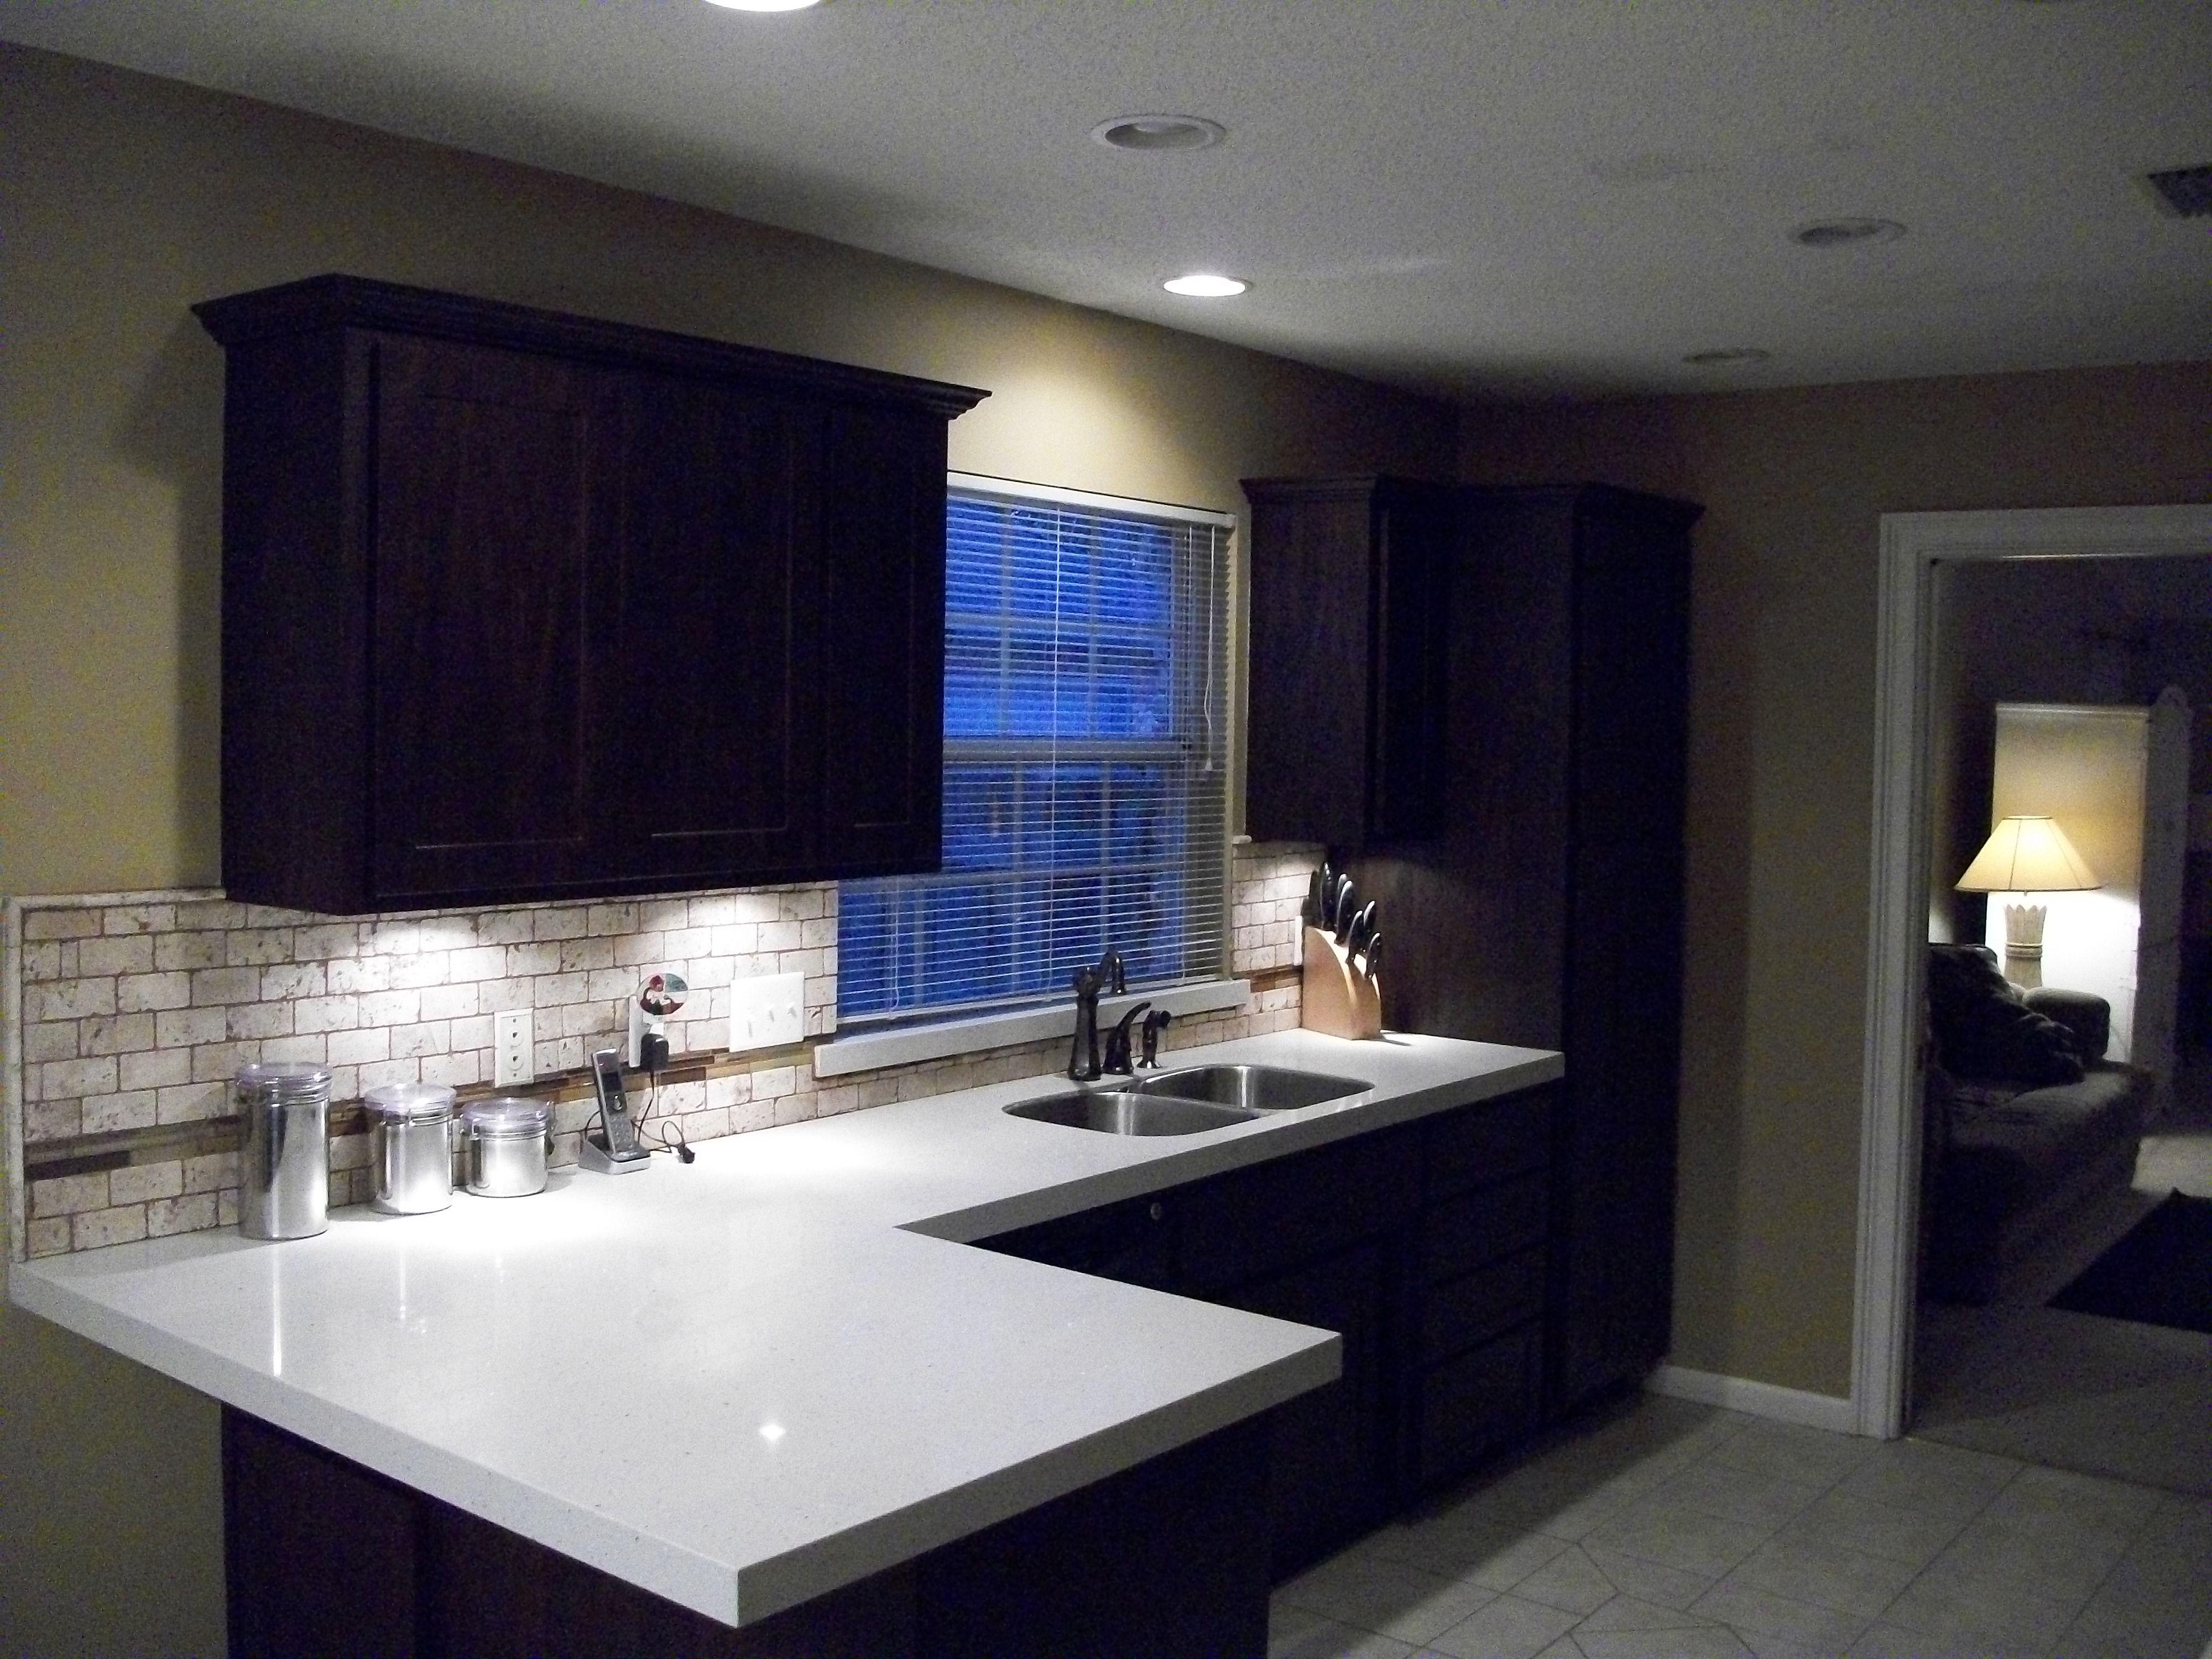 Kitchen Recessed Lighting | Kitchen recessed lighting ...